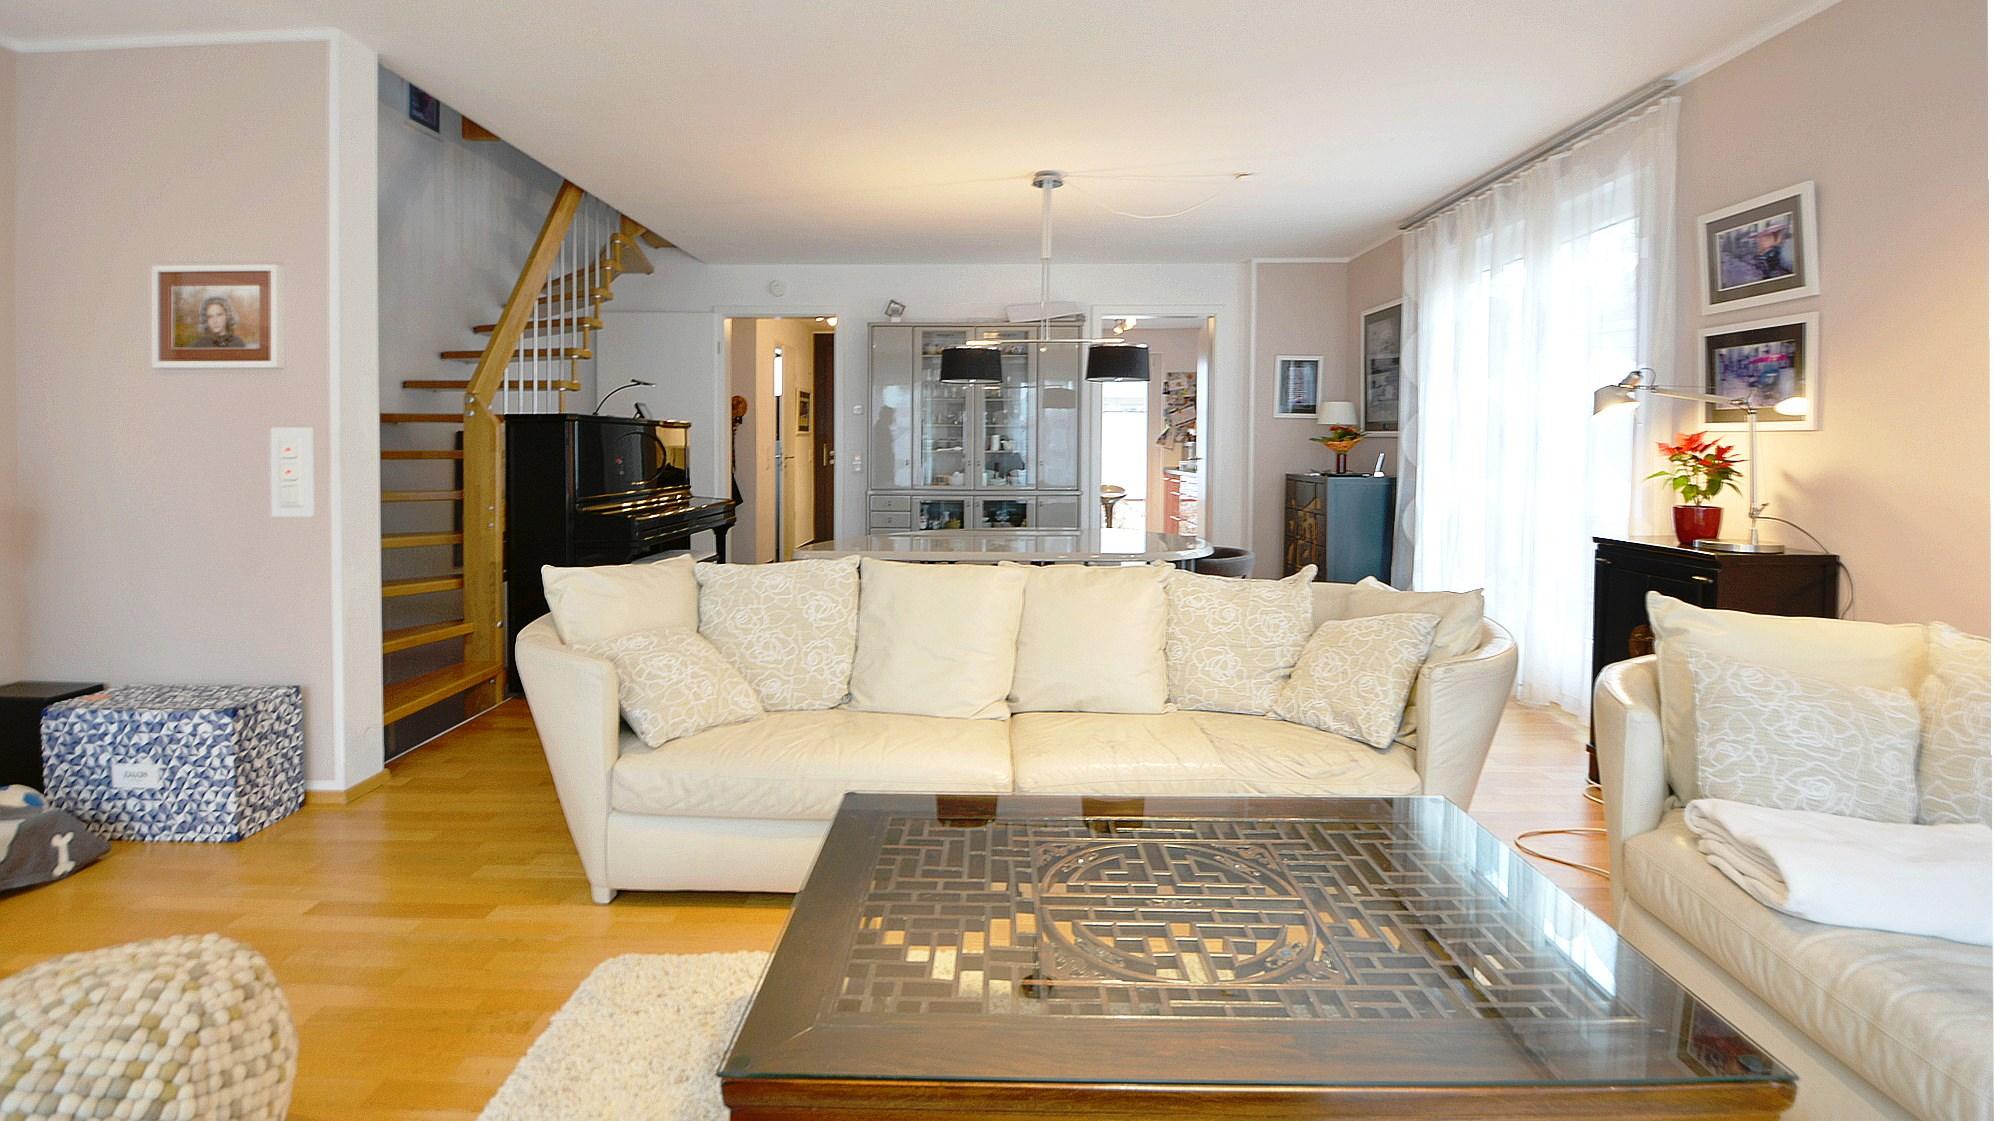 lorenz immobilien m nchen. Black Bedroom Furniture Sets. Home Design Ideas